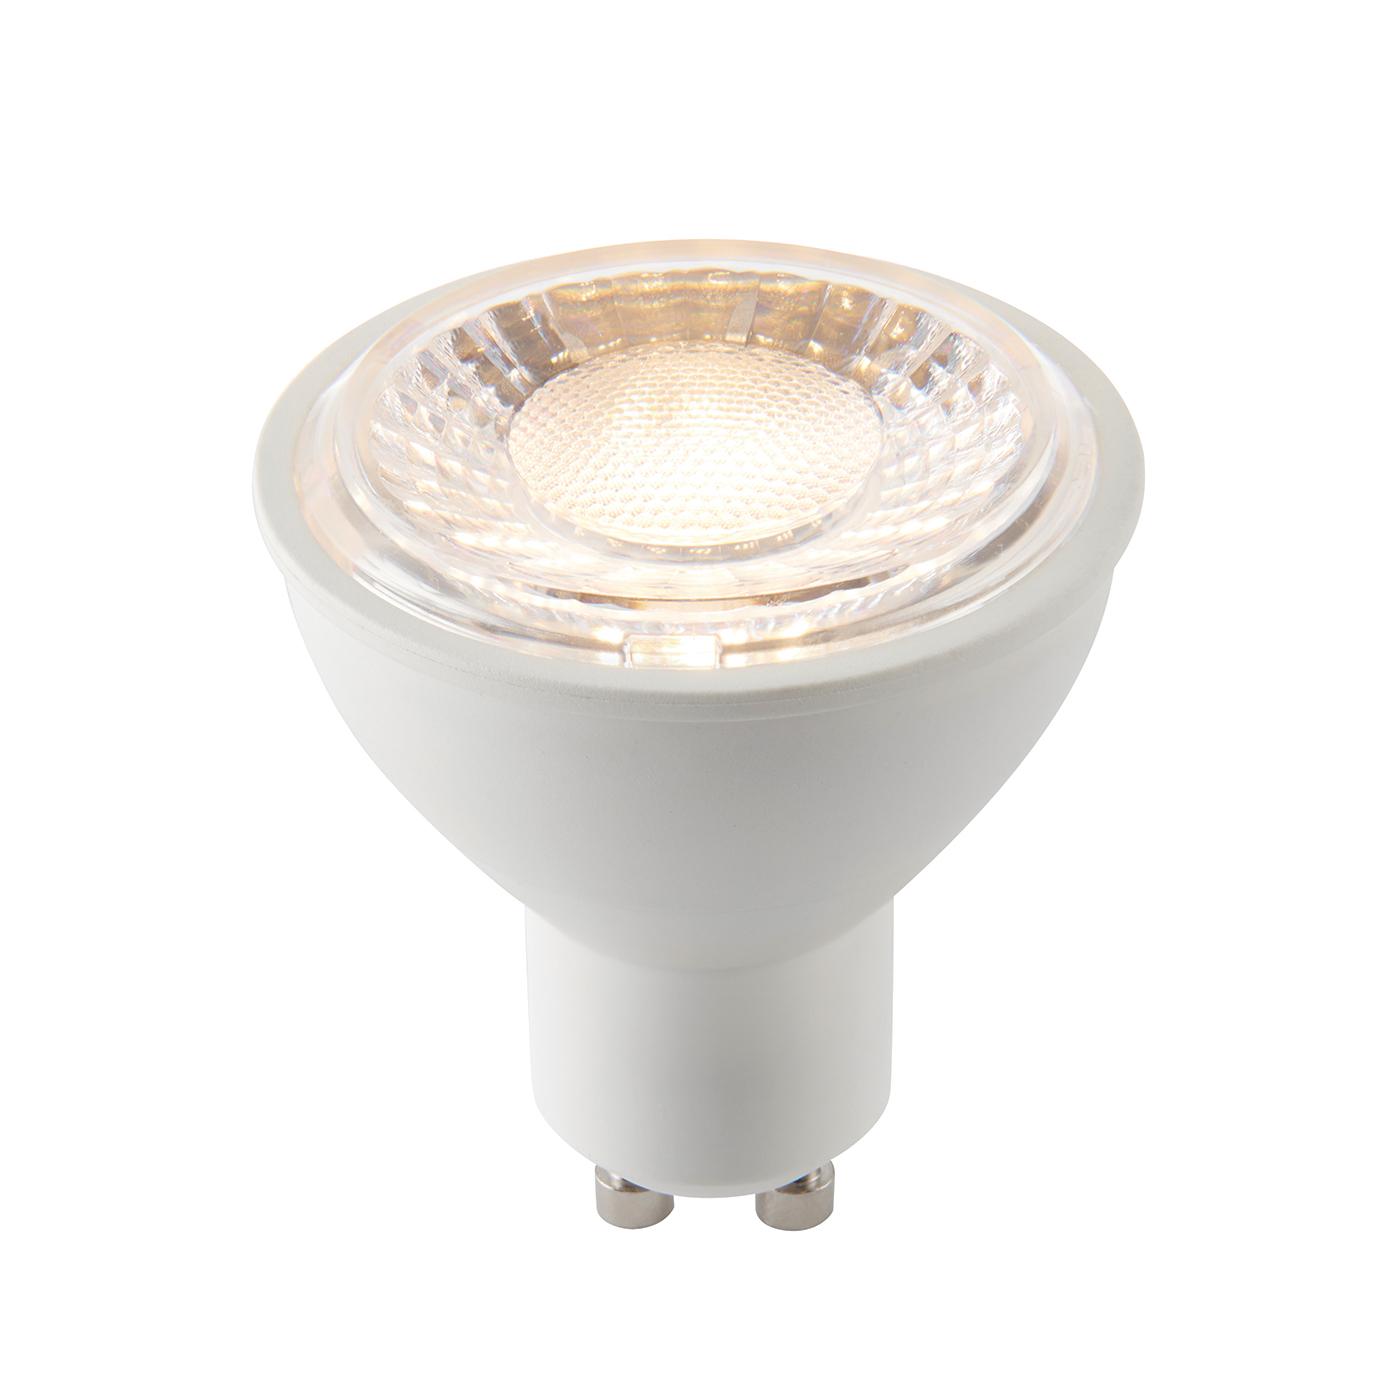 Endon 70045 LED SMD Lamp 3000K GU10 4W